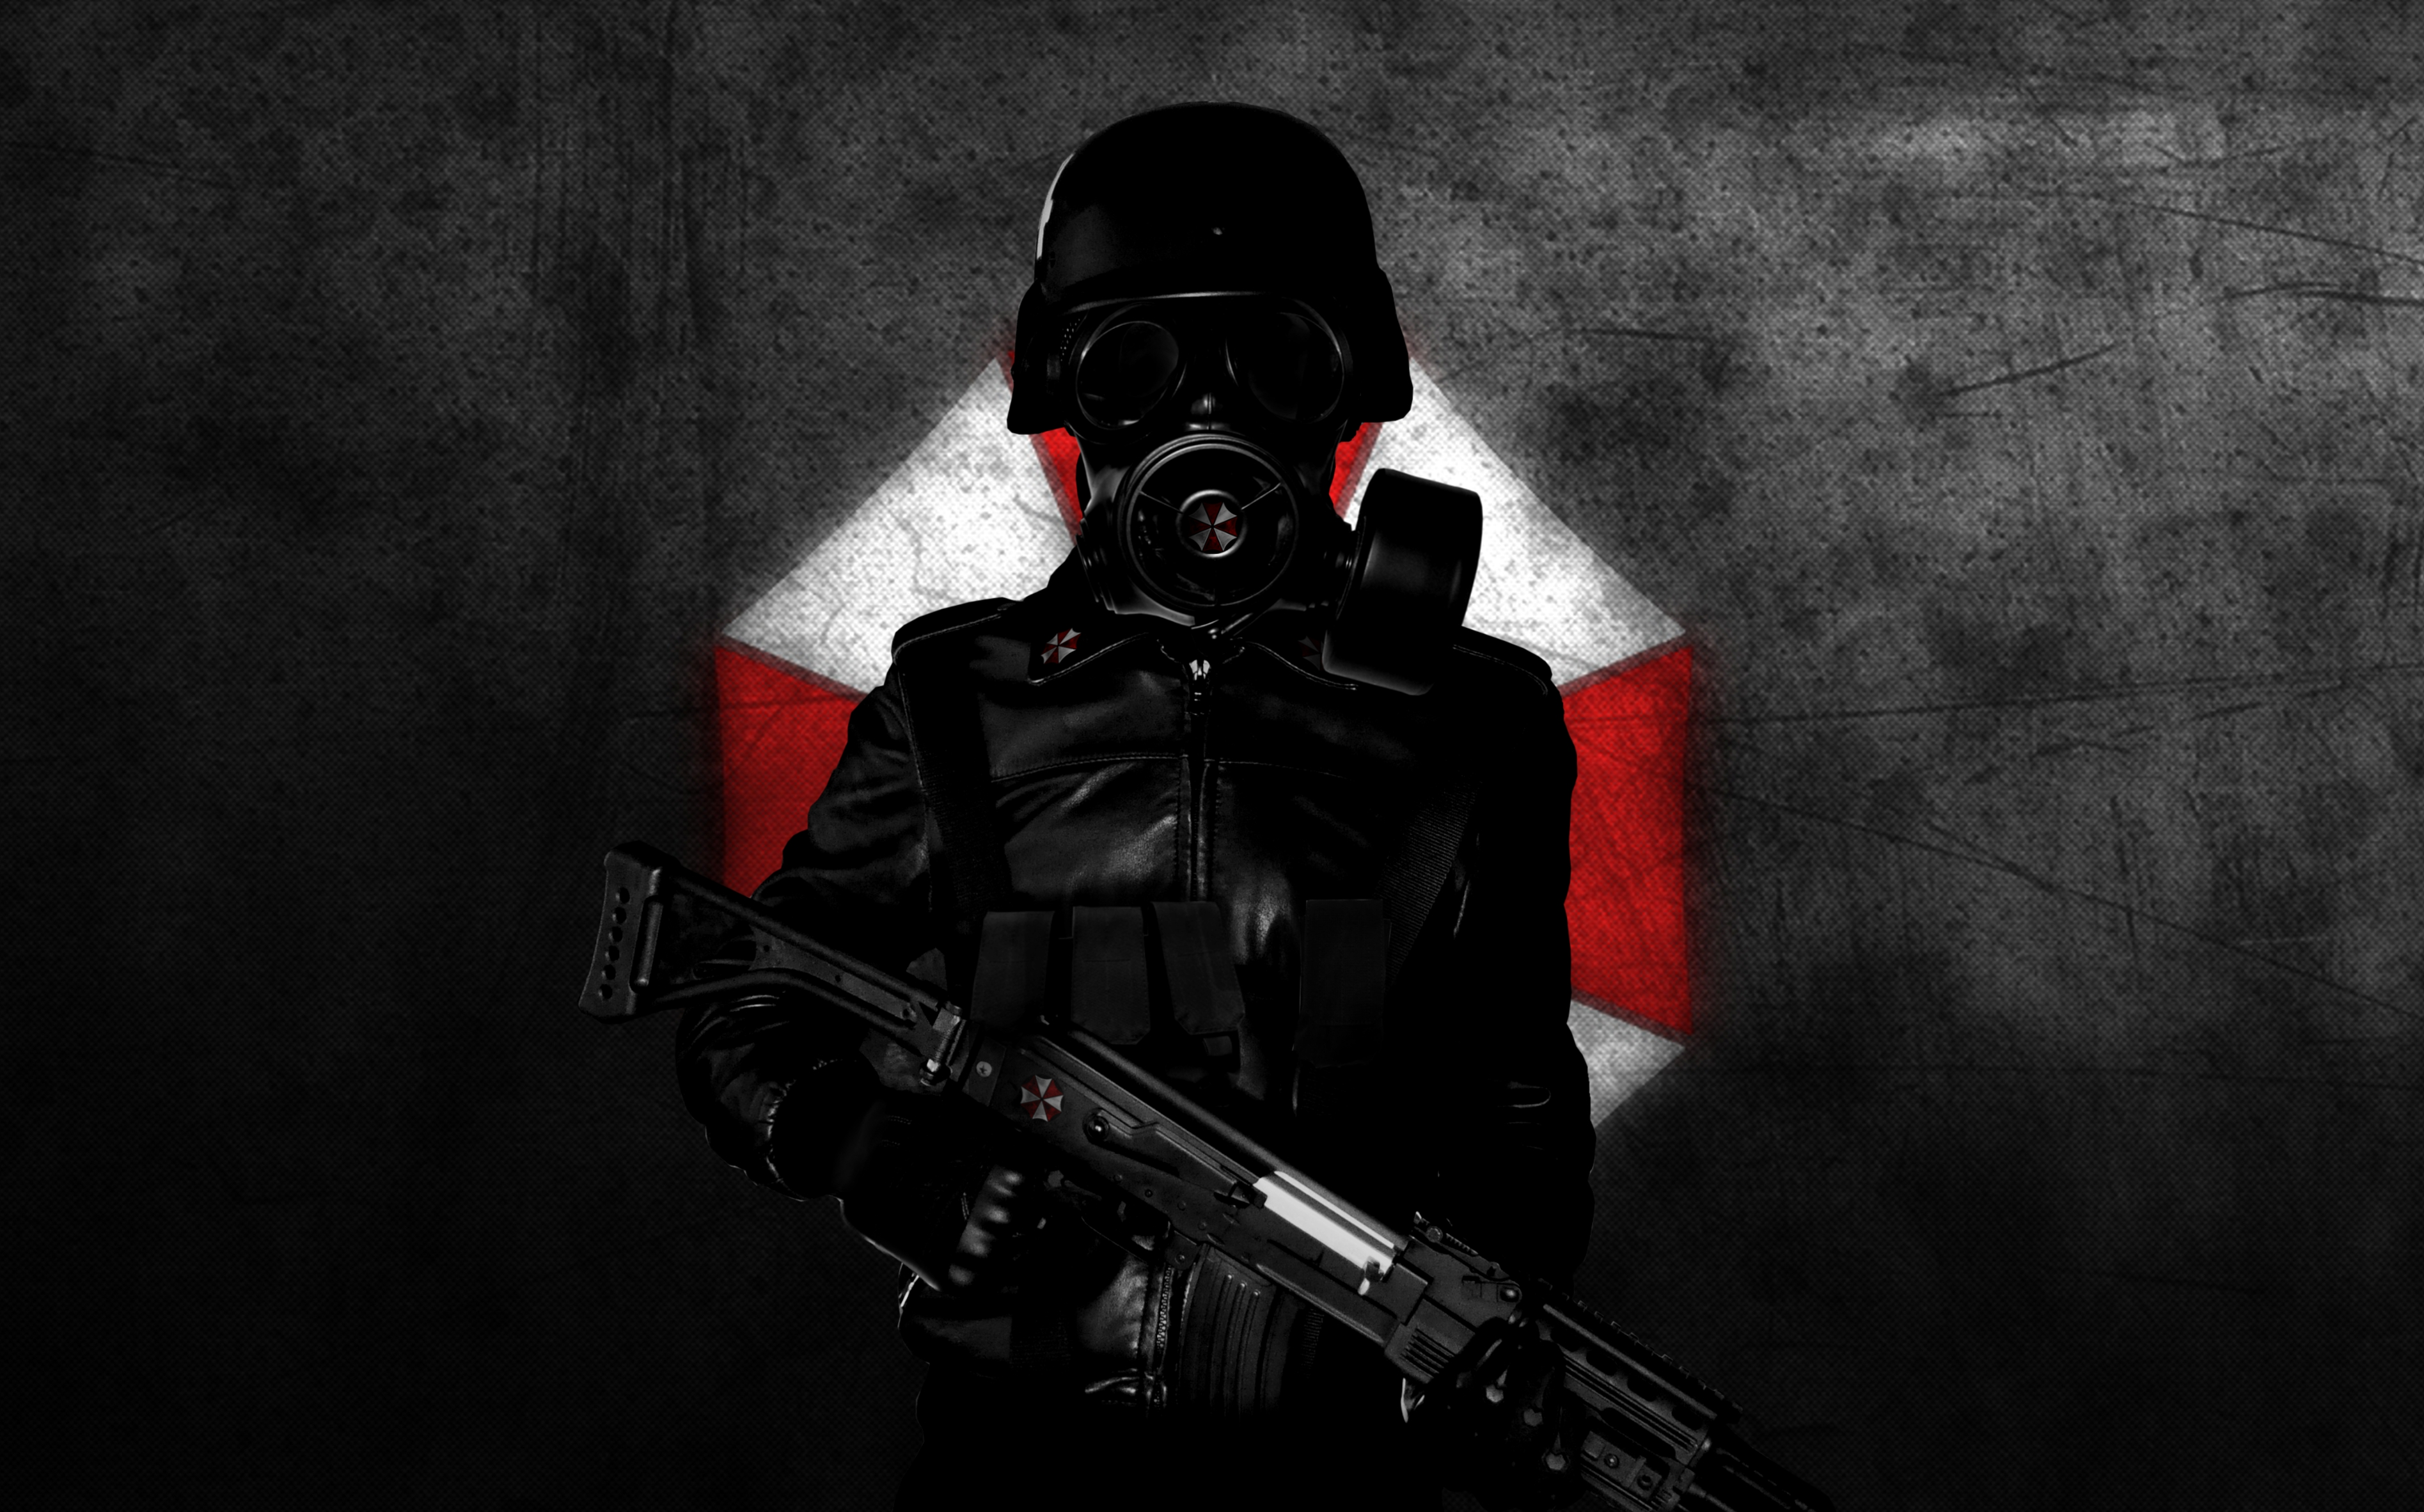 Umbrella Corporation Soldier by GreenTechnology on DeviantArt